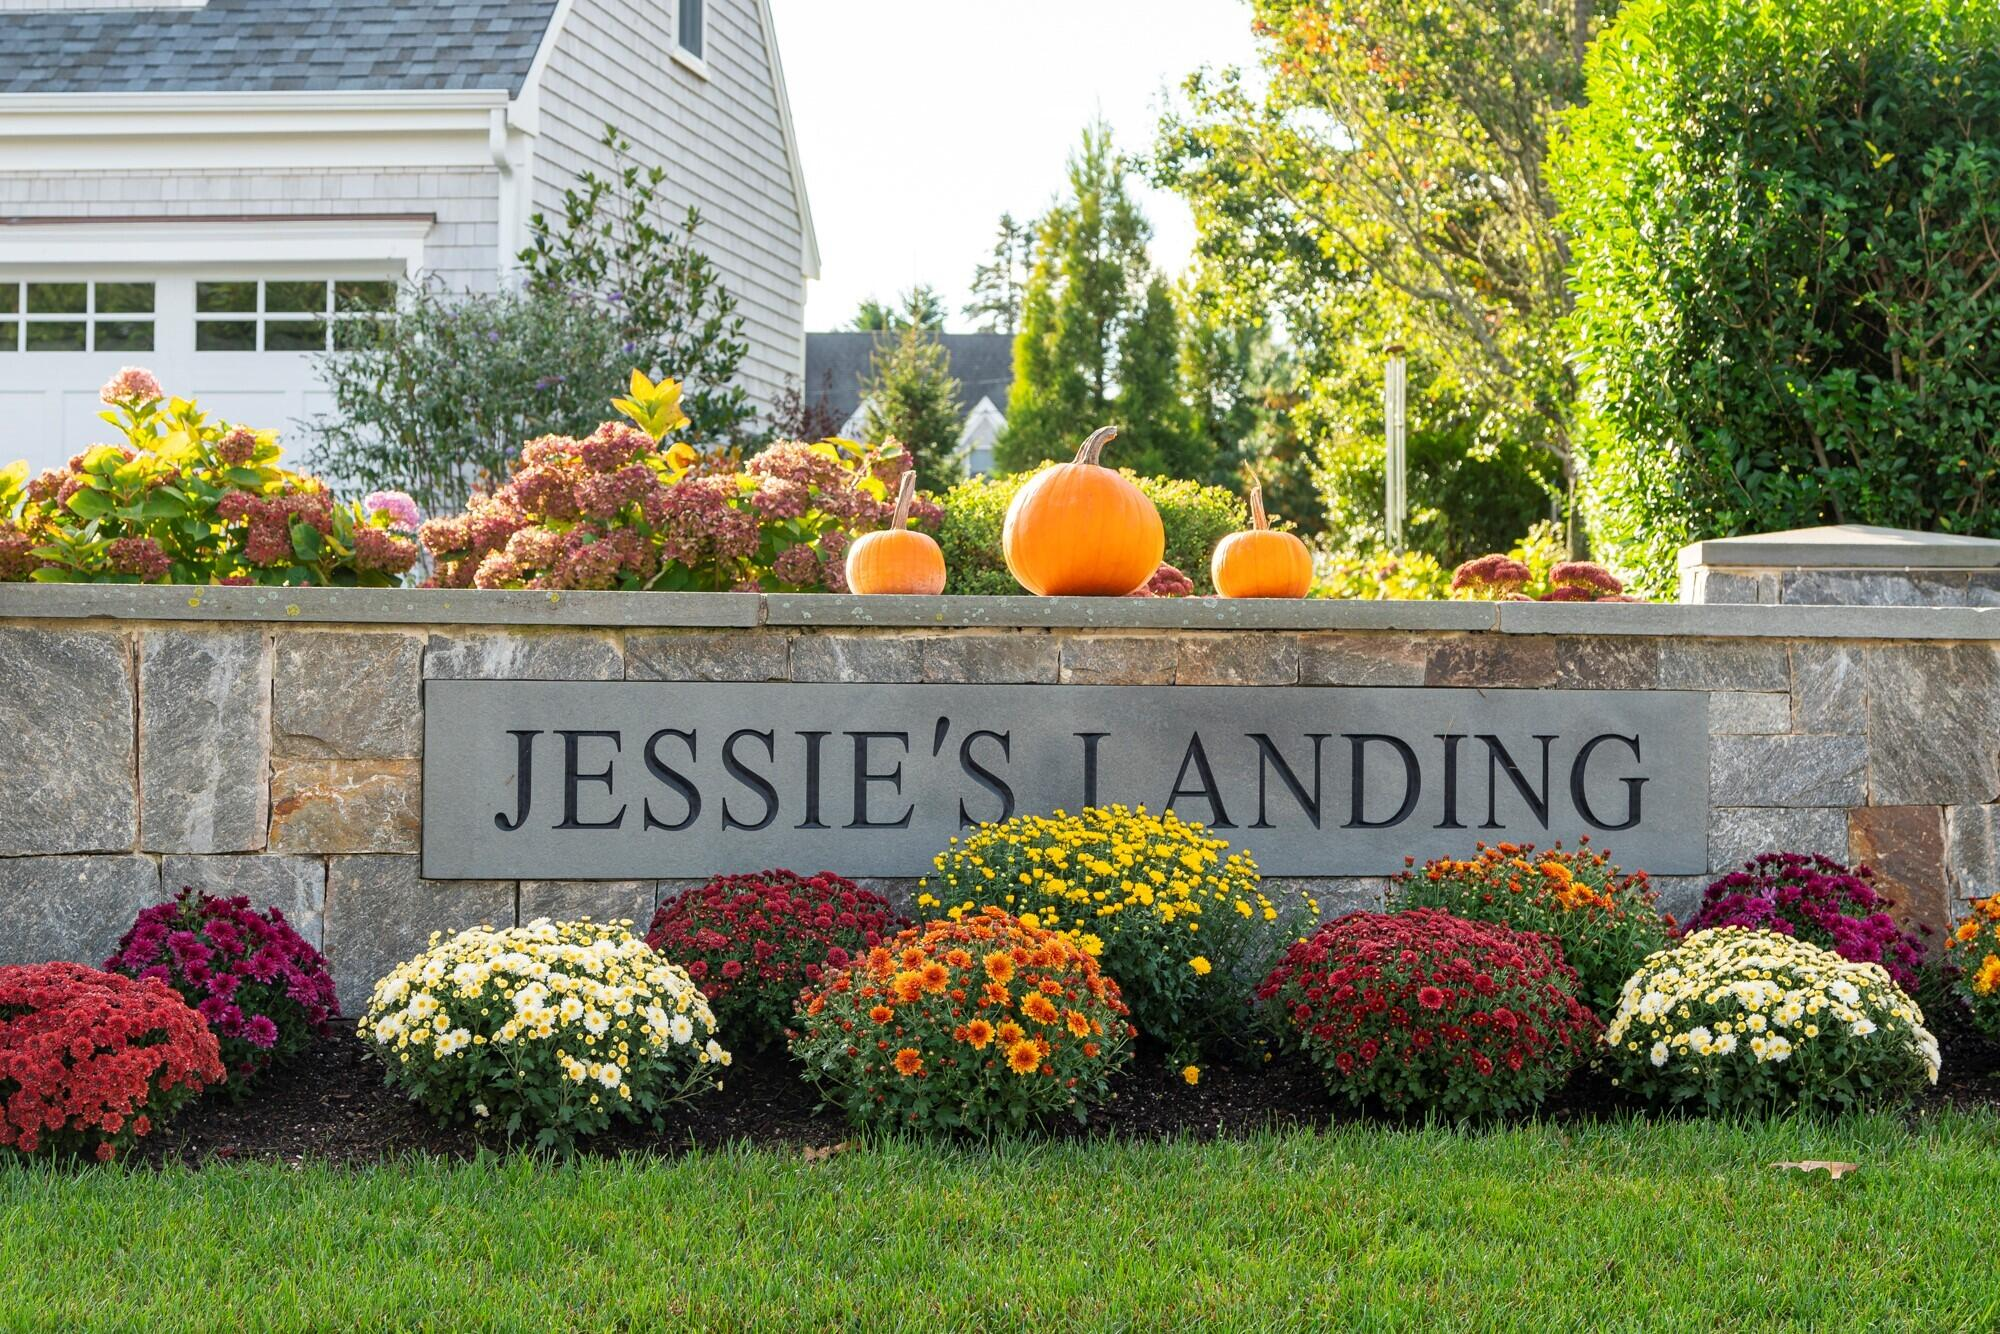 37 Jessies Landing, Chatham, MA  02633 - slide 1